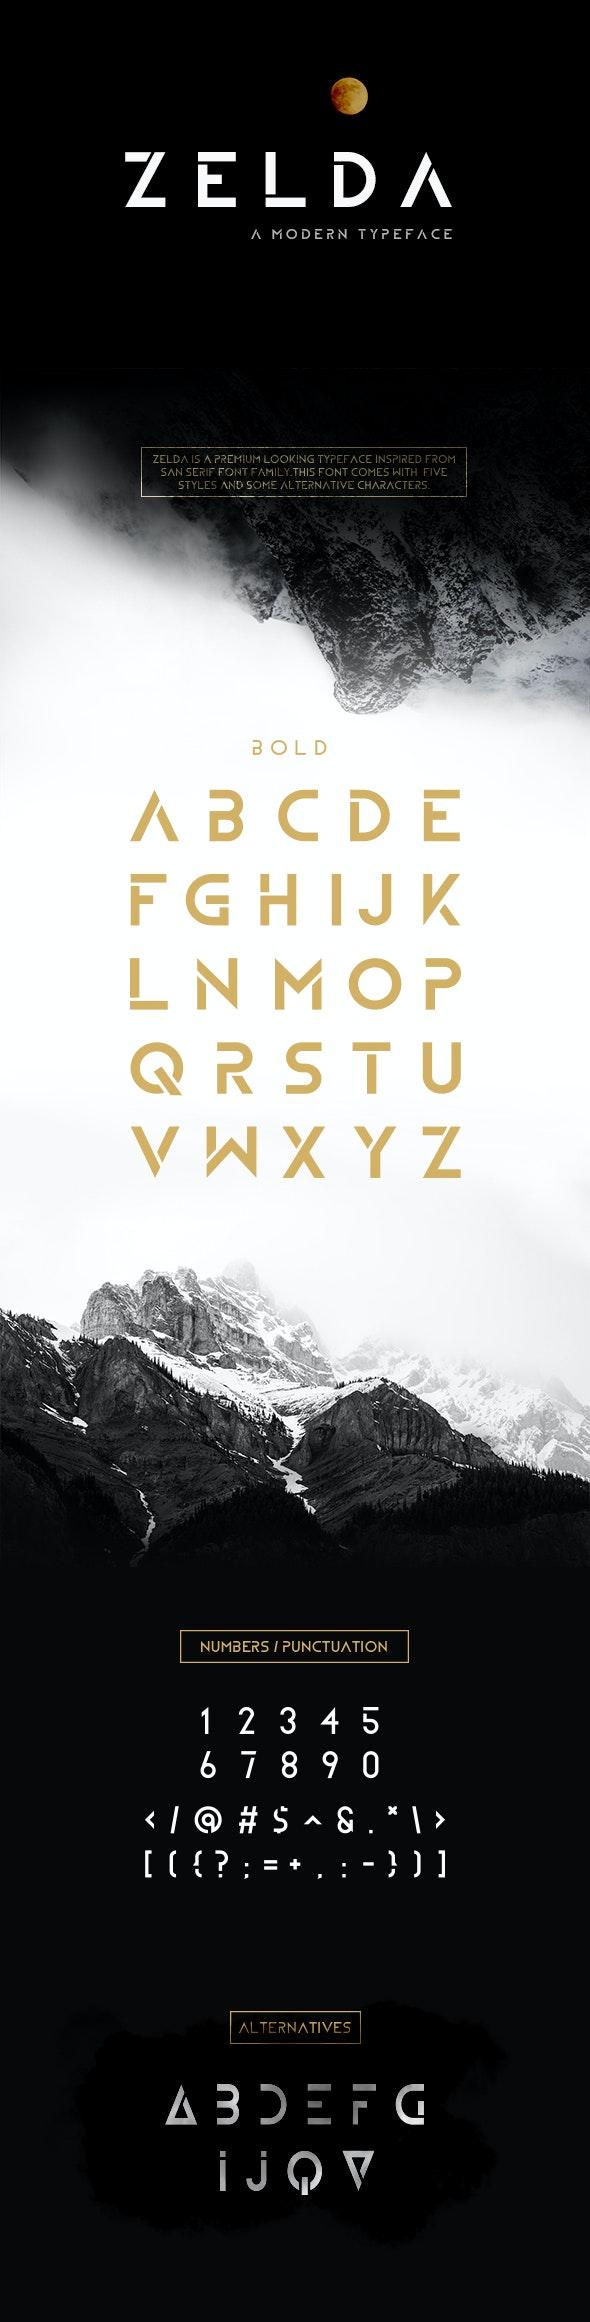 ZELDA Typeface (BOLD) - Sans-Serif Fonts